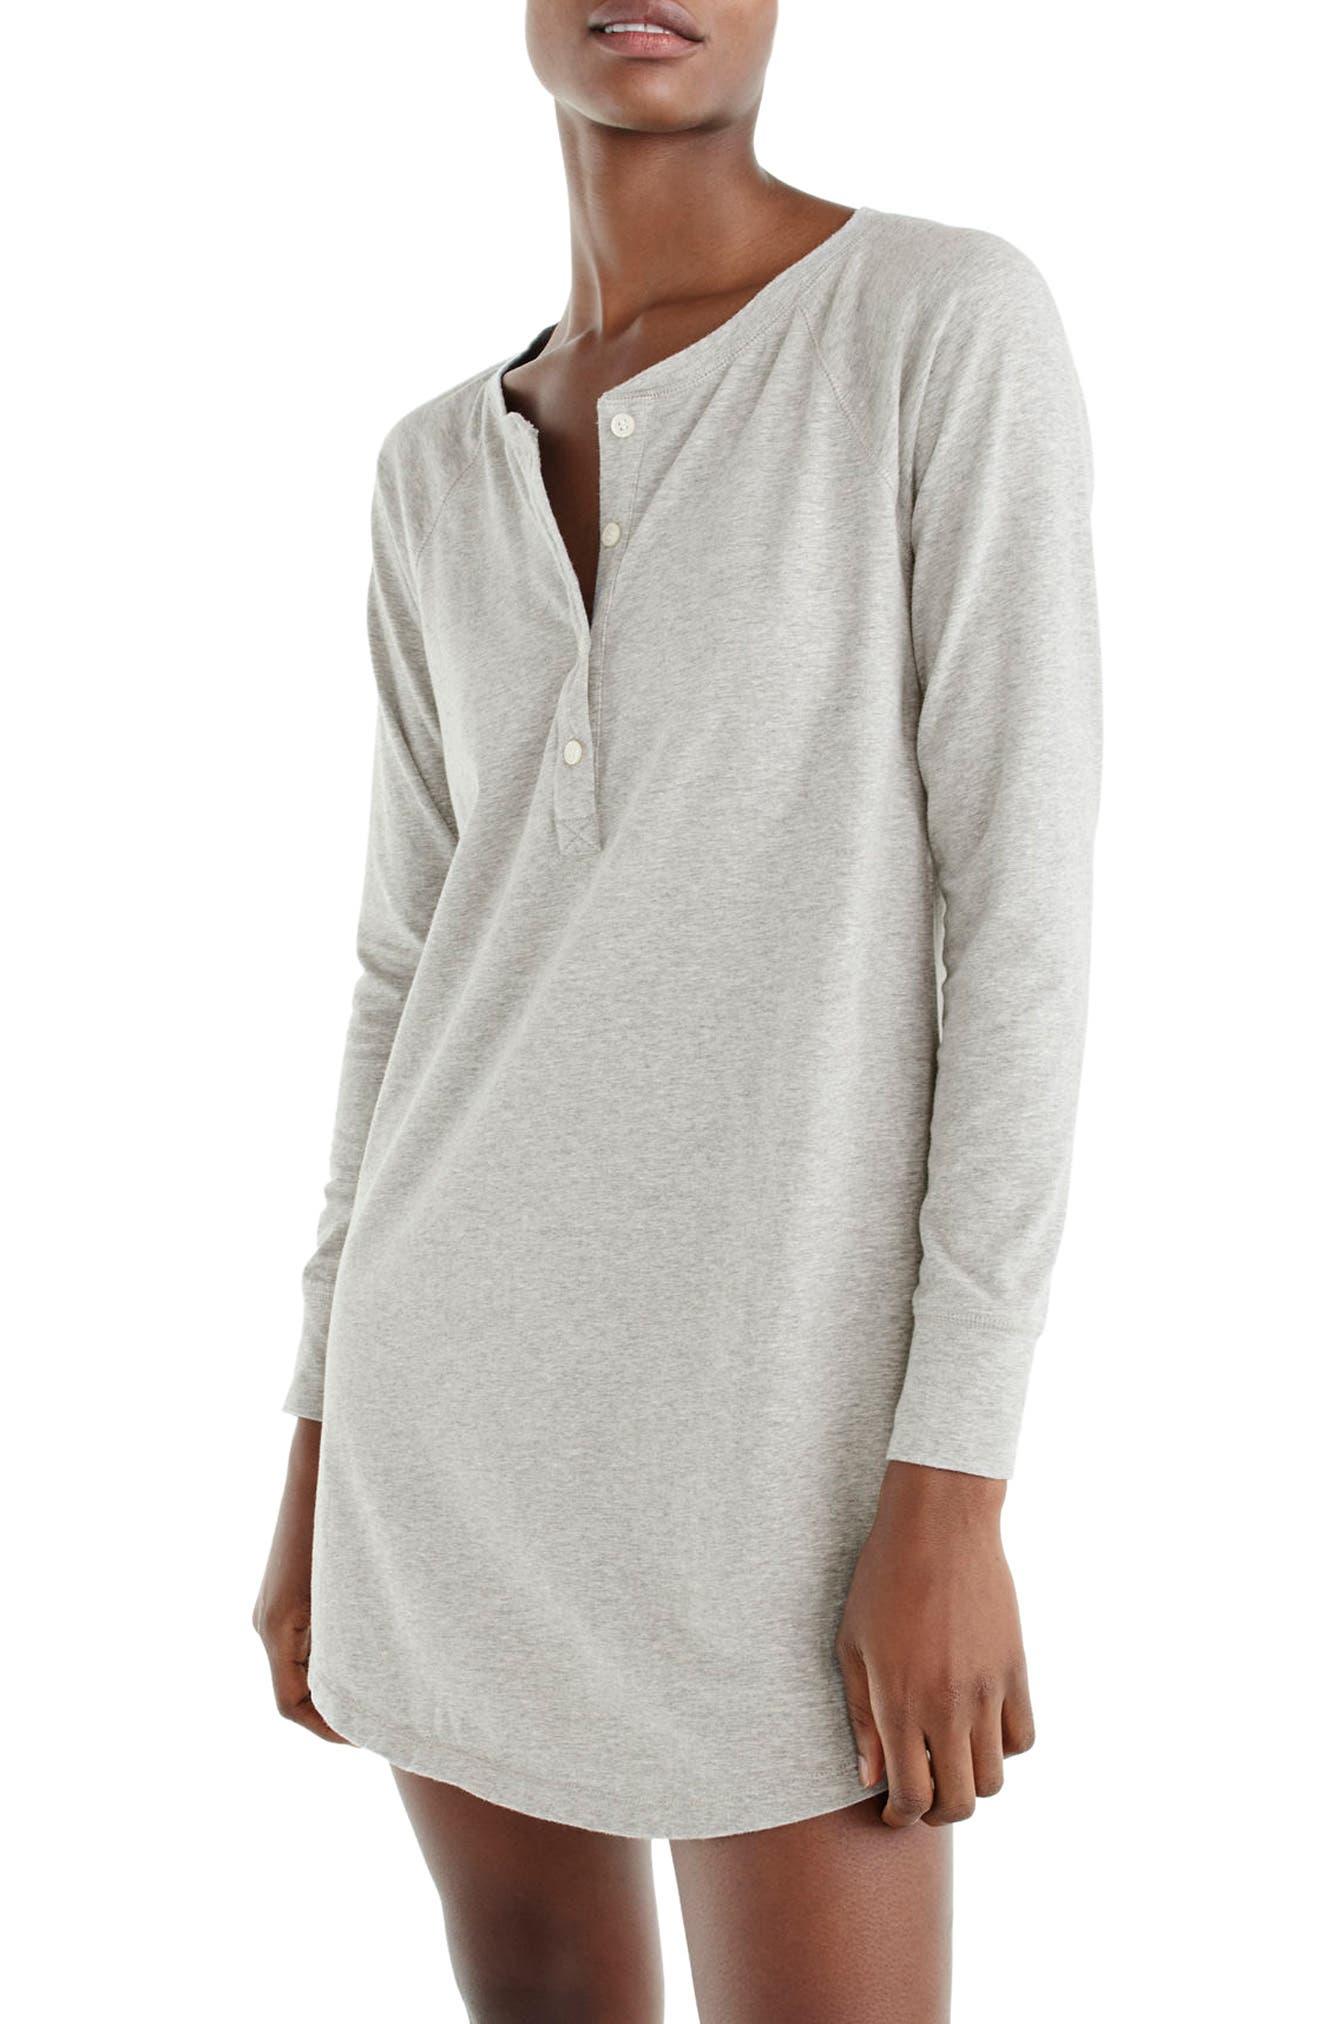 Knit Sleep Shirt,                         Main,                         color, Heather Grey